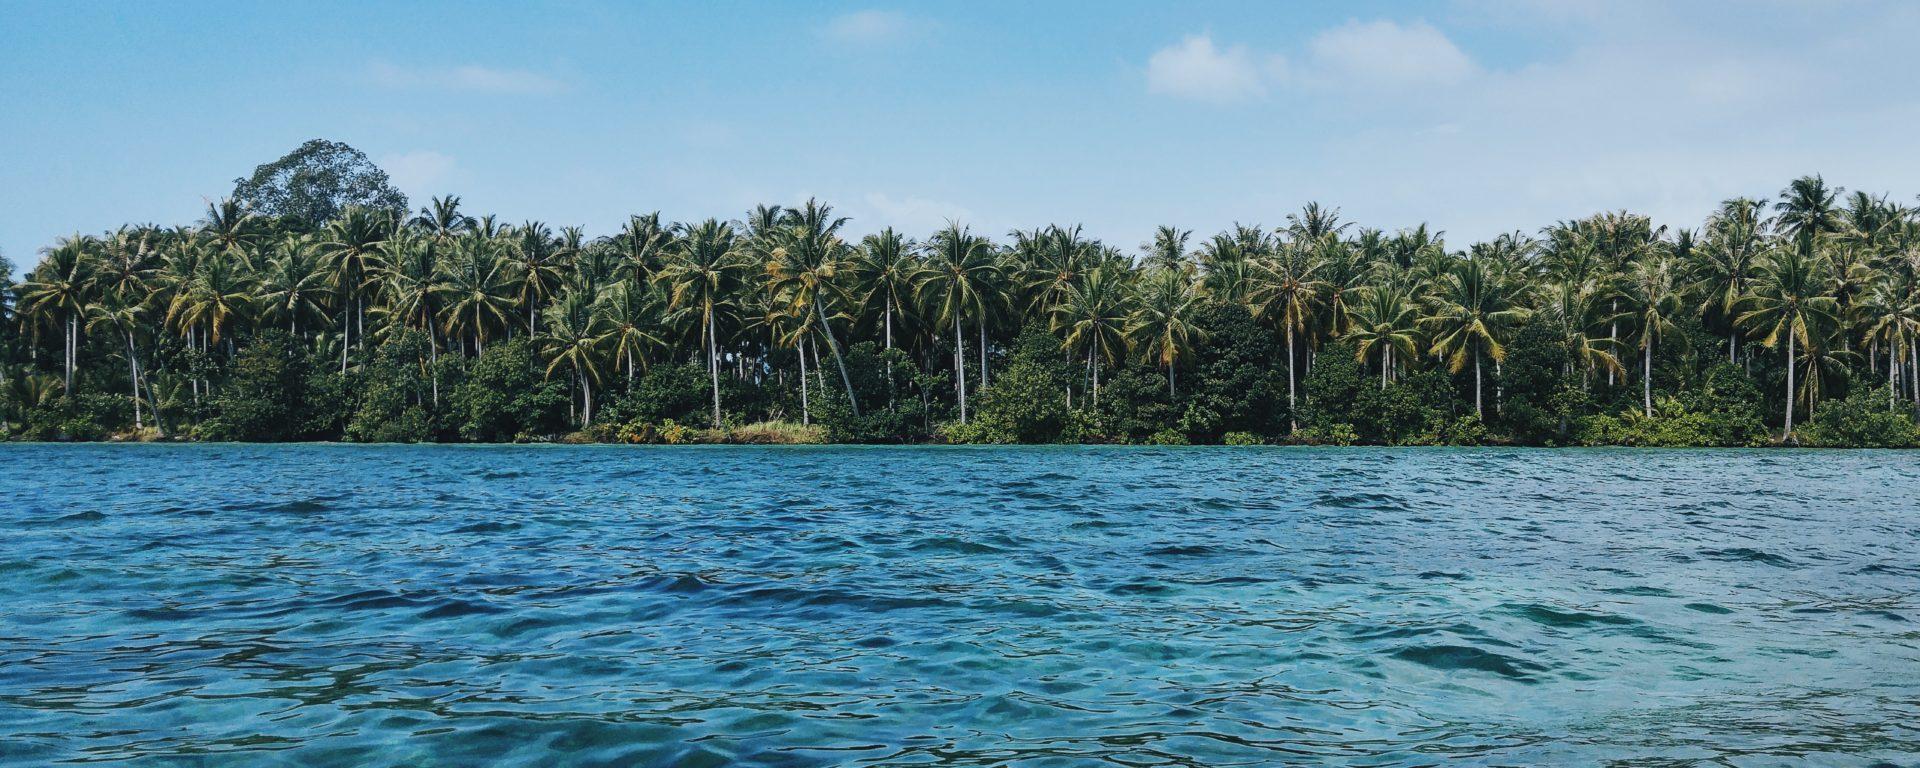 palmen insel stocksnap